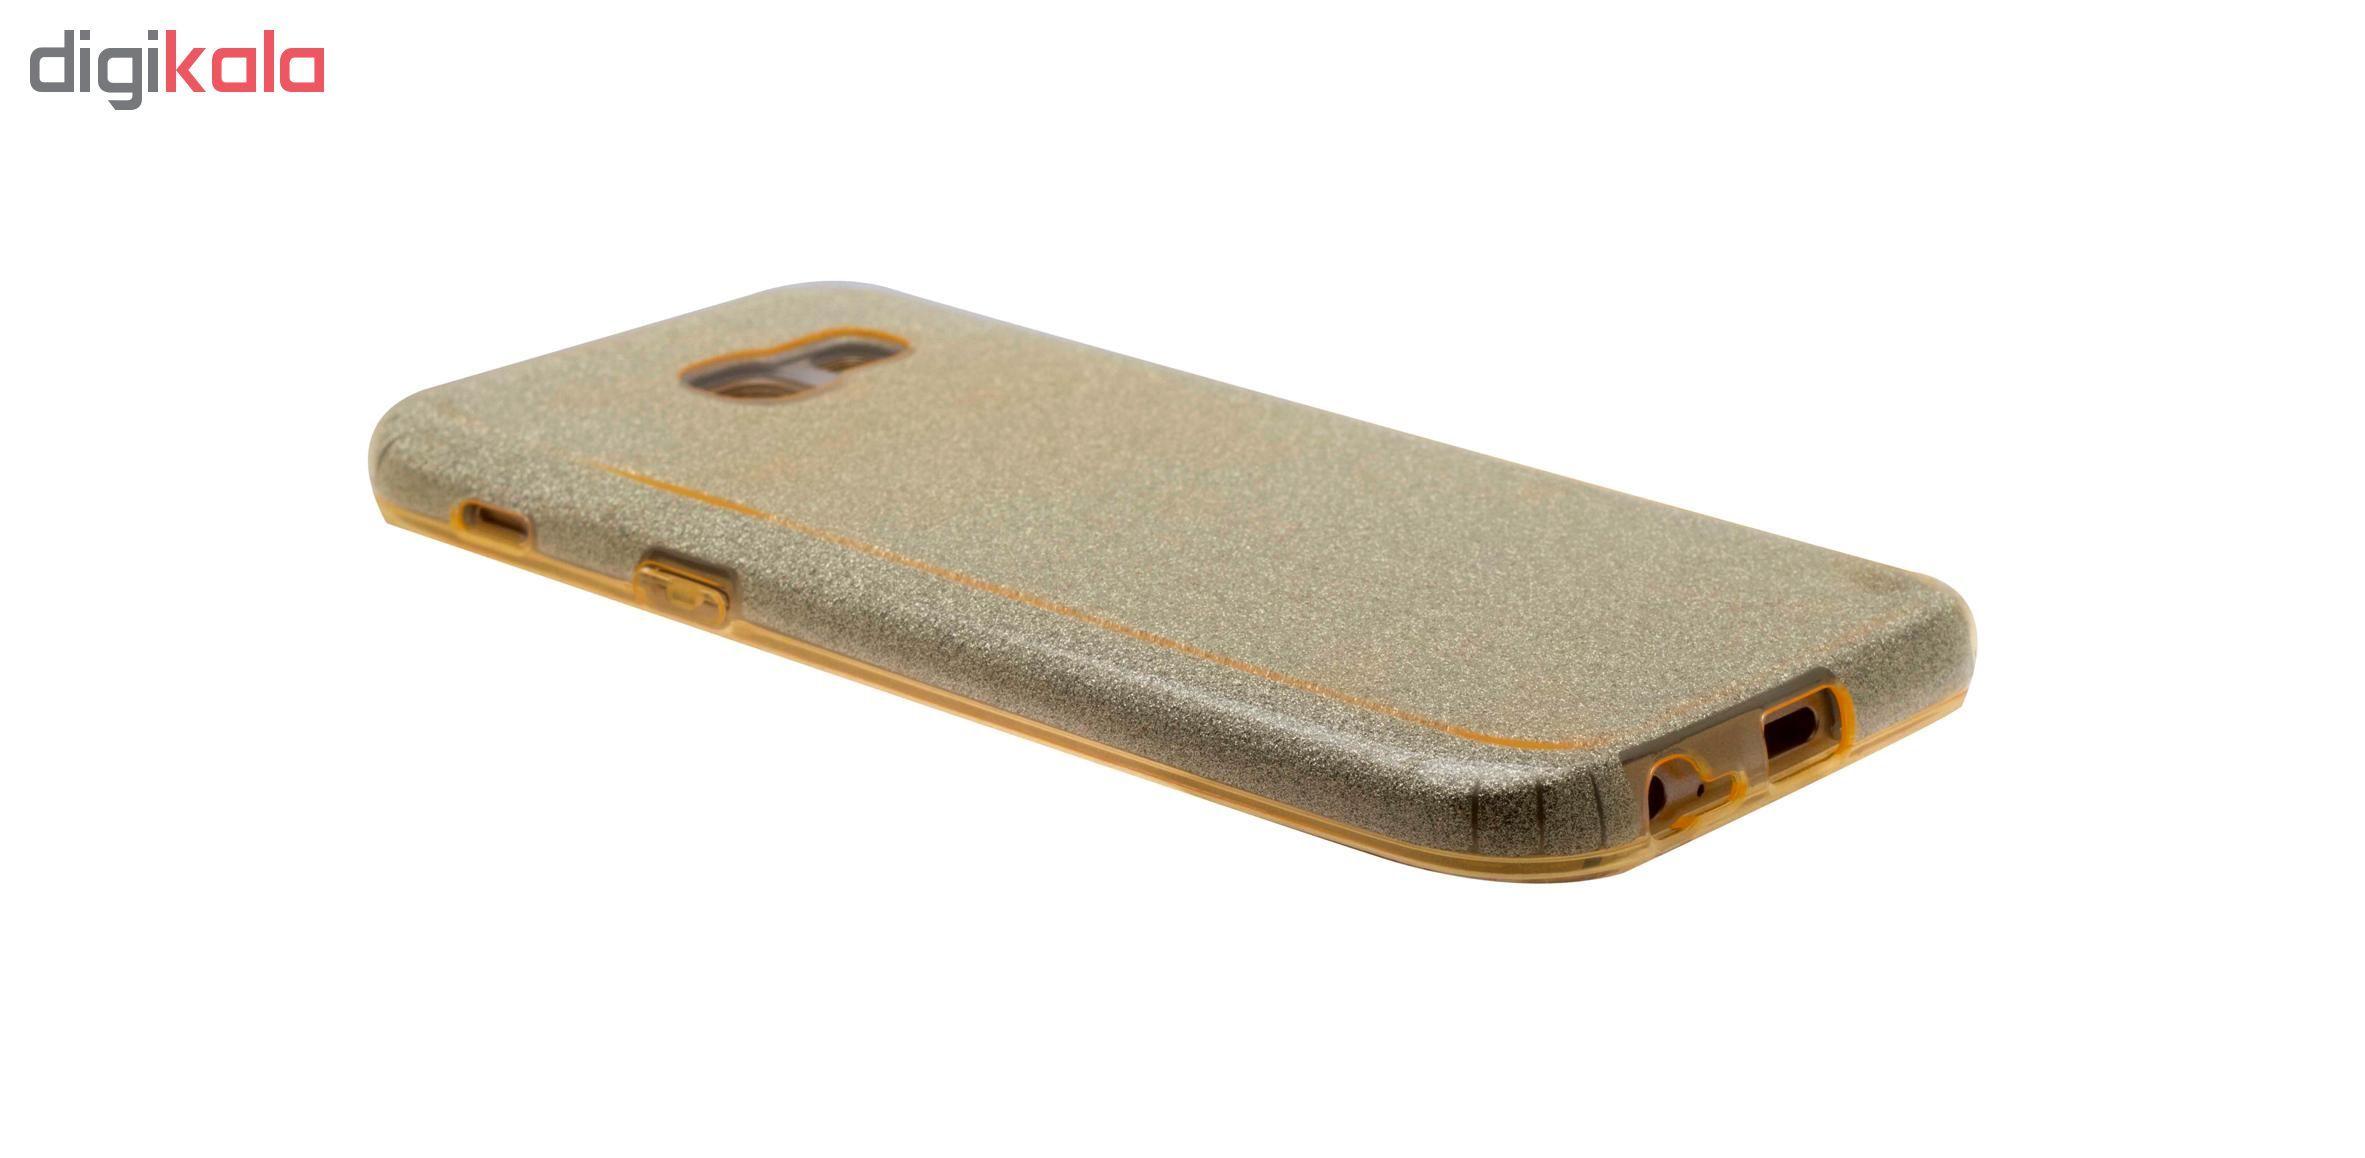 کاور مدل CORONA طرح اکلیلی مناسب برای گوشی سامسونگ گلکسی A5 2017 / A520 main 1 15